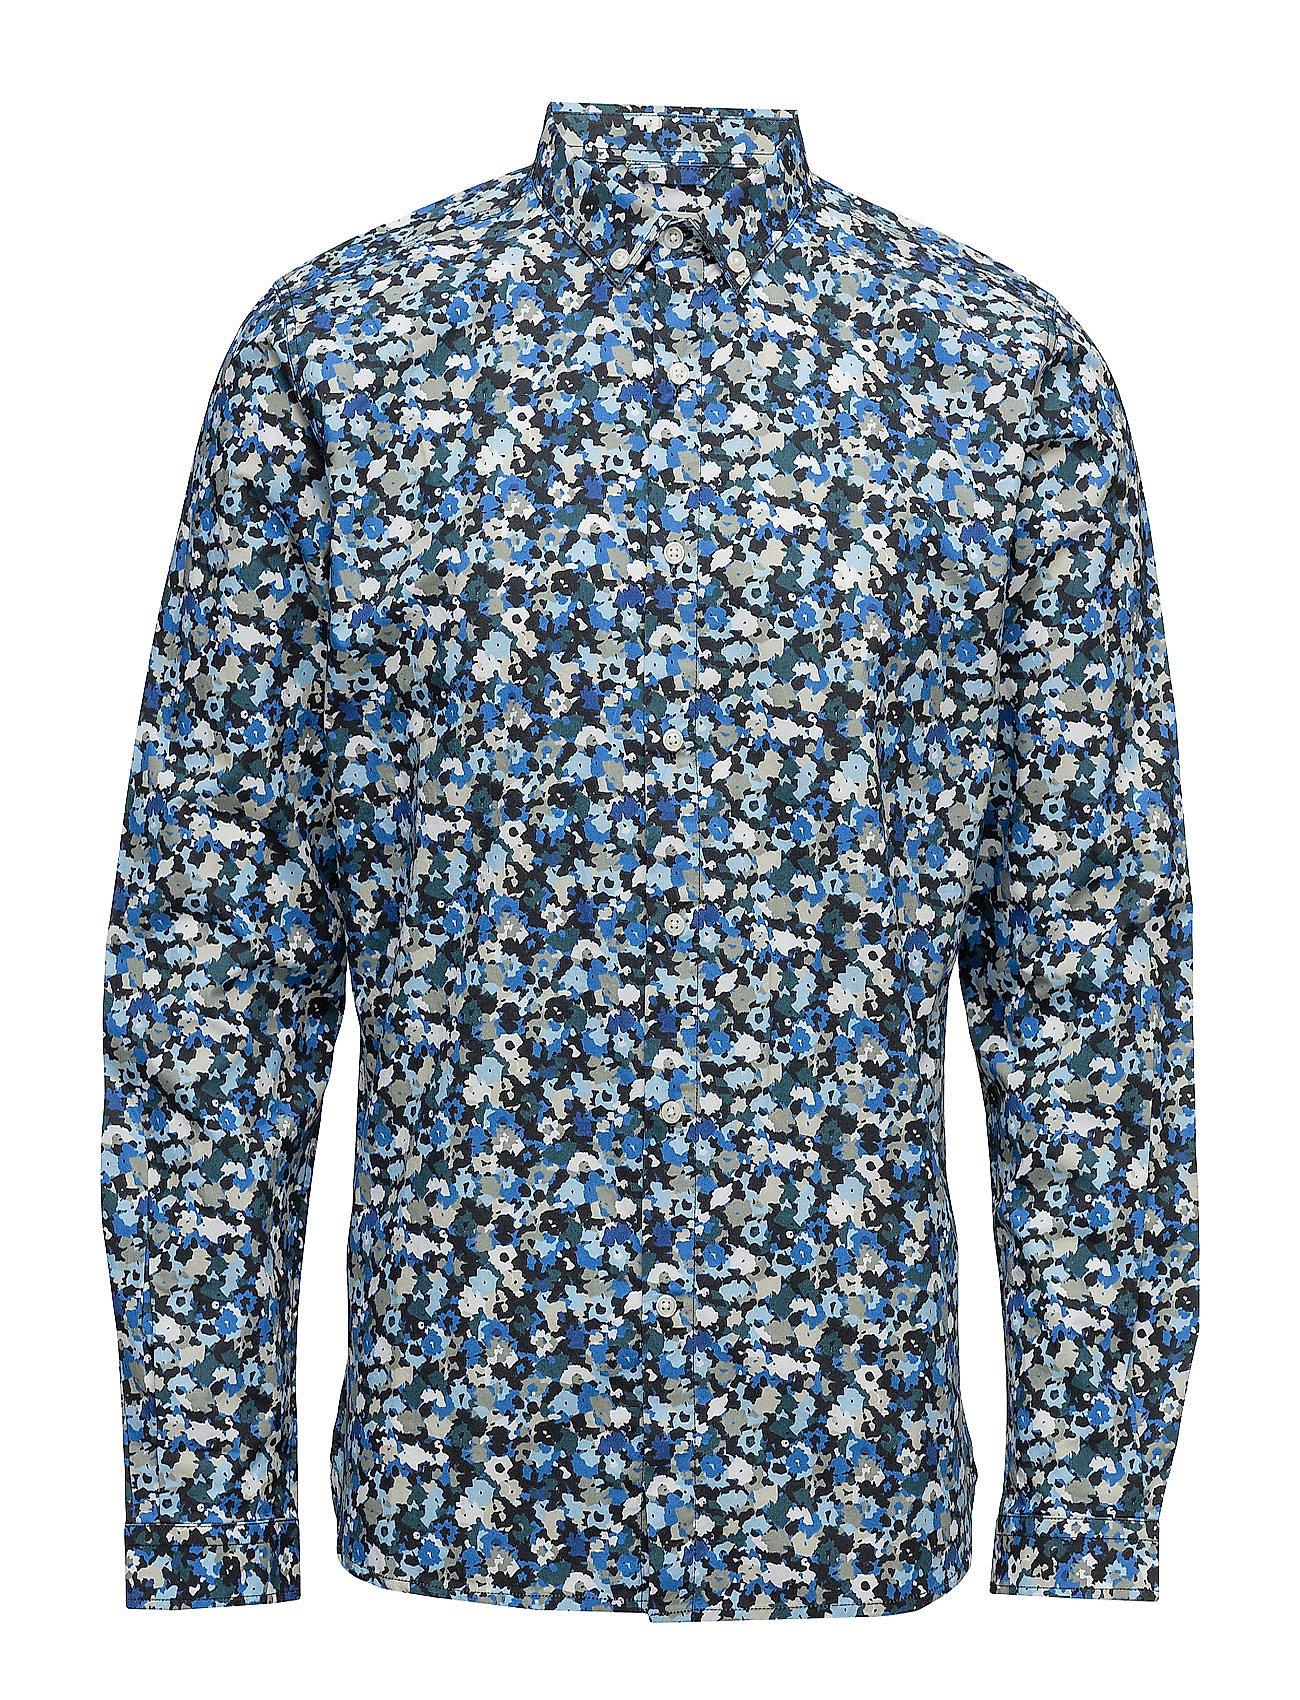 Poplin Shirt W/All Over Flower Prin Knowledge Cotton Apparel Casual sko til Herrer i